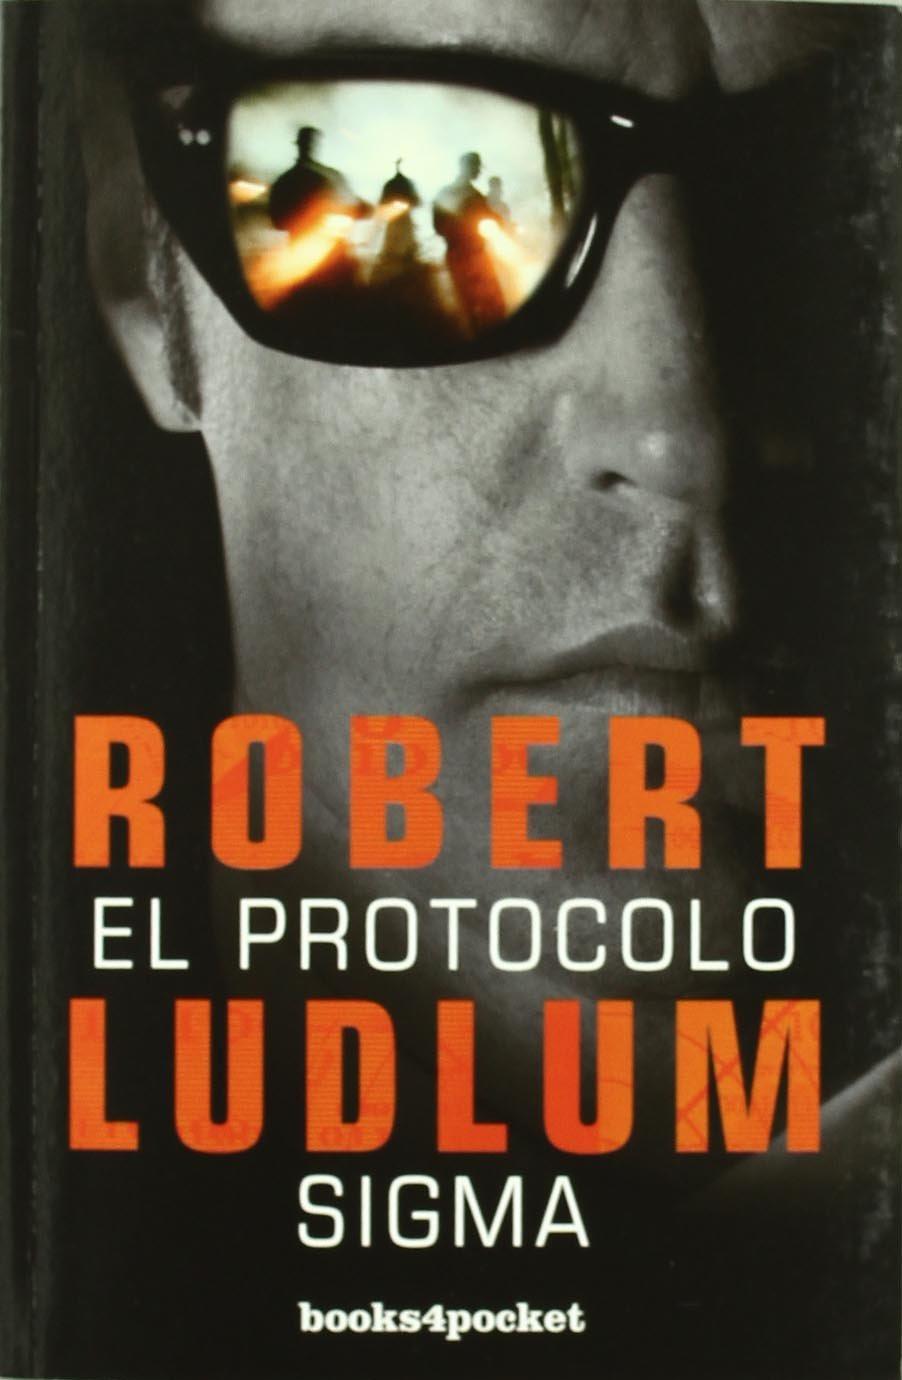 El protocolo Sigma (Spanish Edition) ePub fb2 book